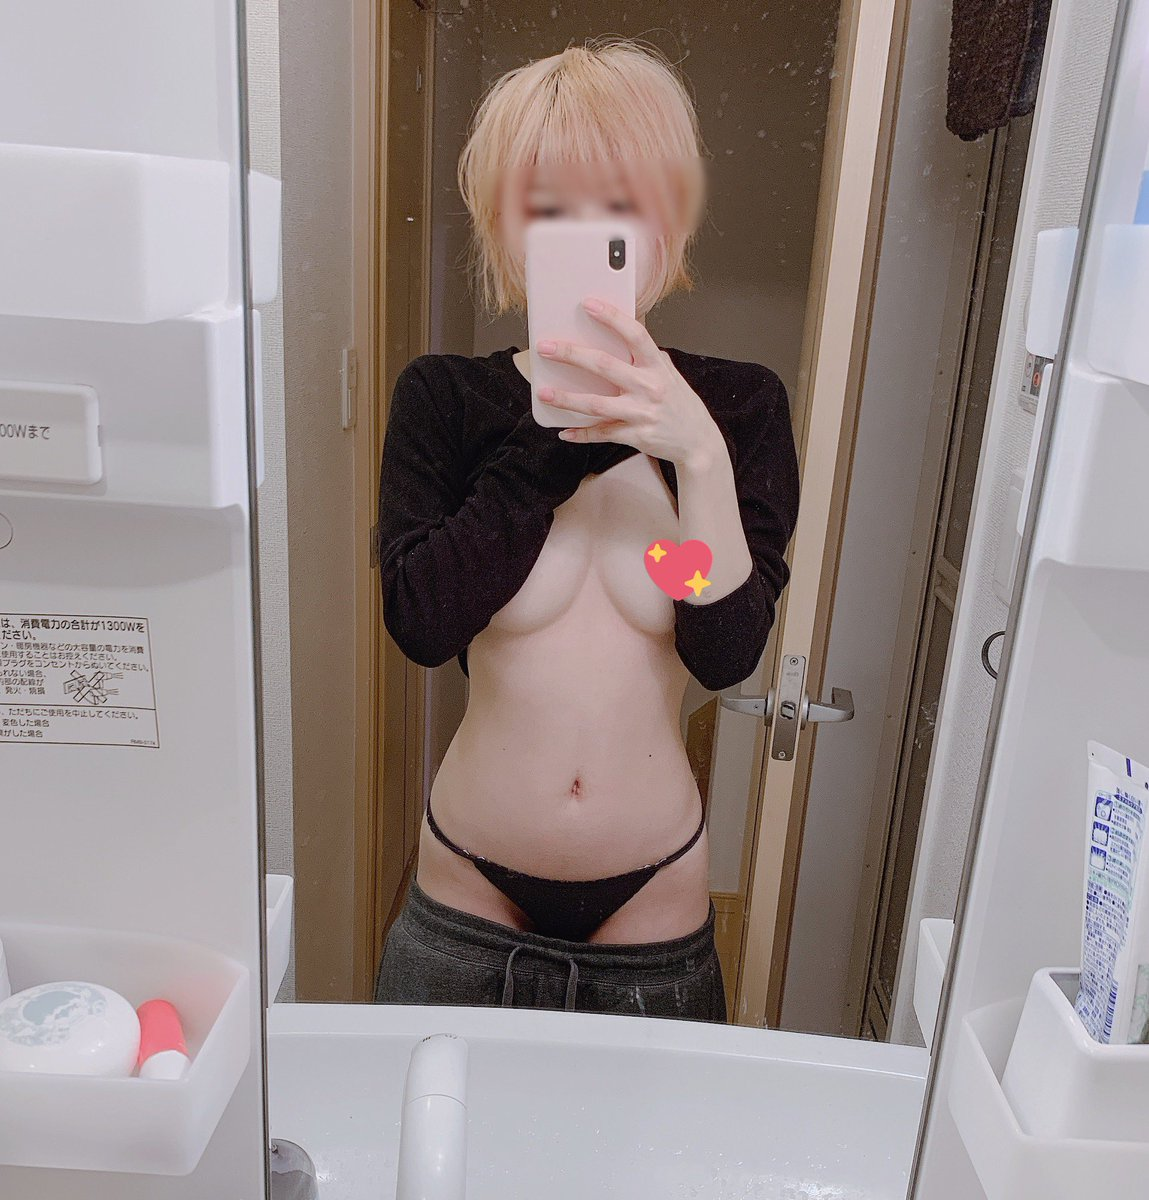 Twitter 御伽 樒 御伽樒(Otogi Shikimi)🦈@6/20コスケット(@otogi_shi)のオススメツイート画像まとめ